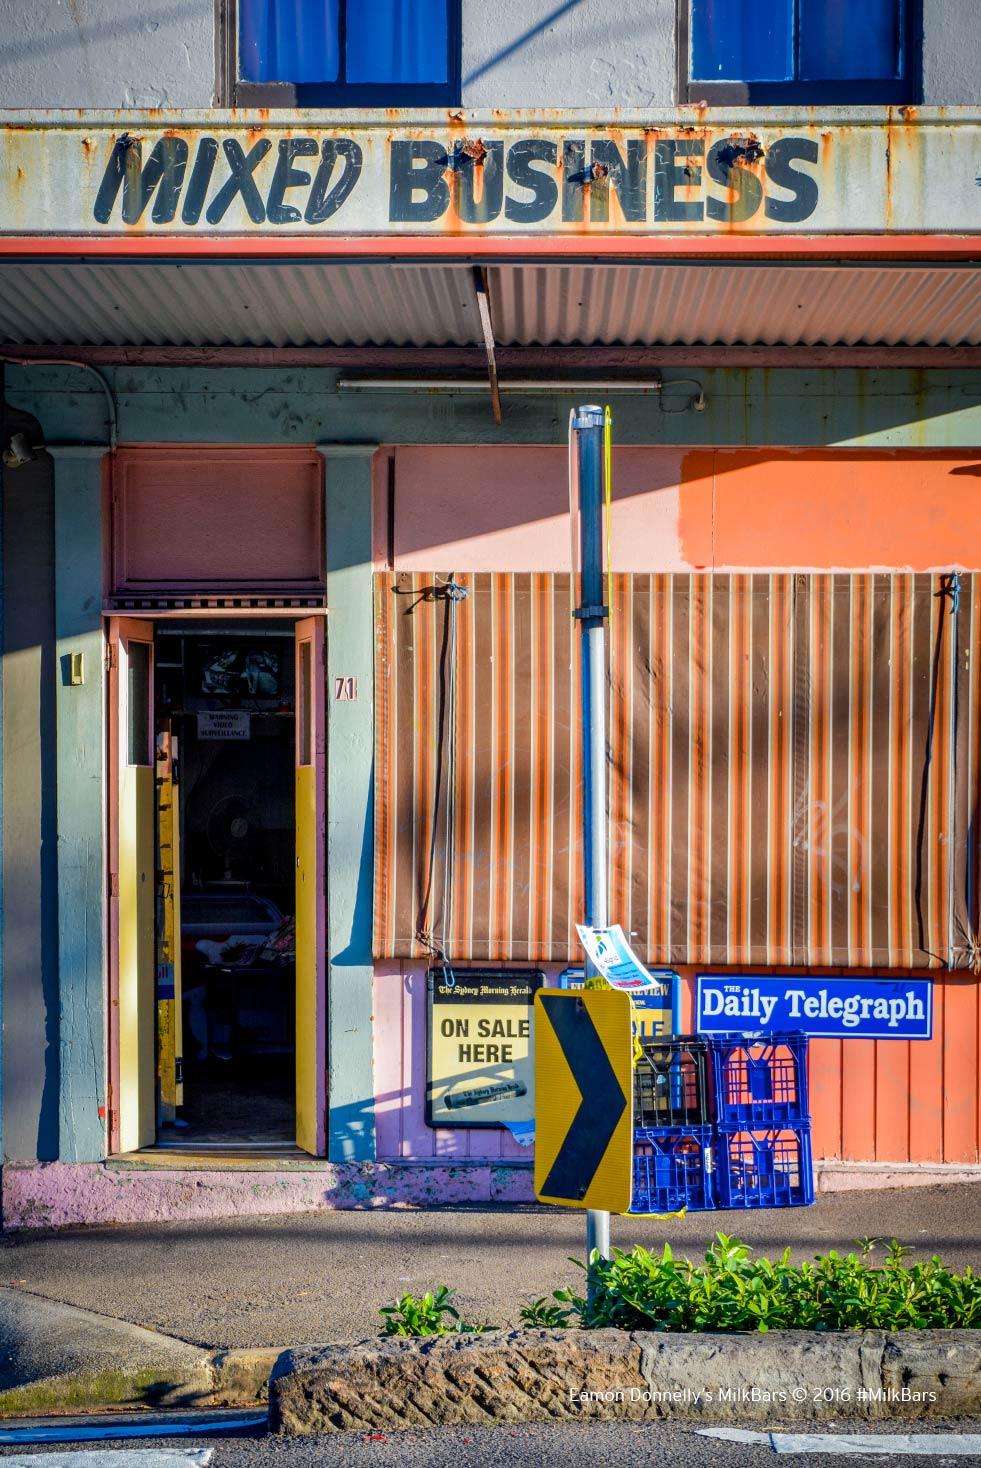 Sydney-Milk-Bar-Night-Eamon-Donnelly's-Milk-Bars-Book-Project-(c)-2001-2016.jpg